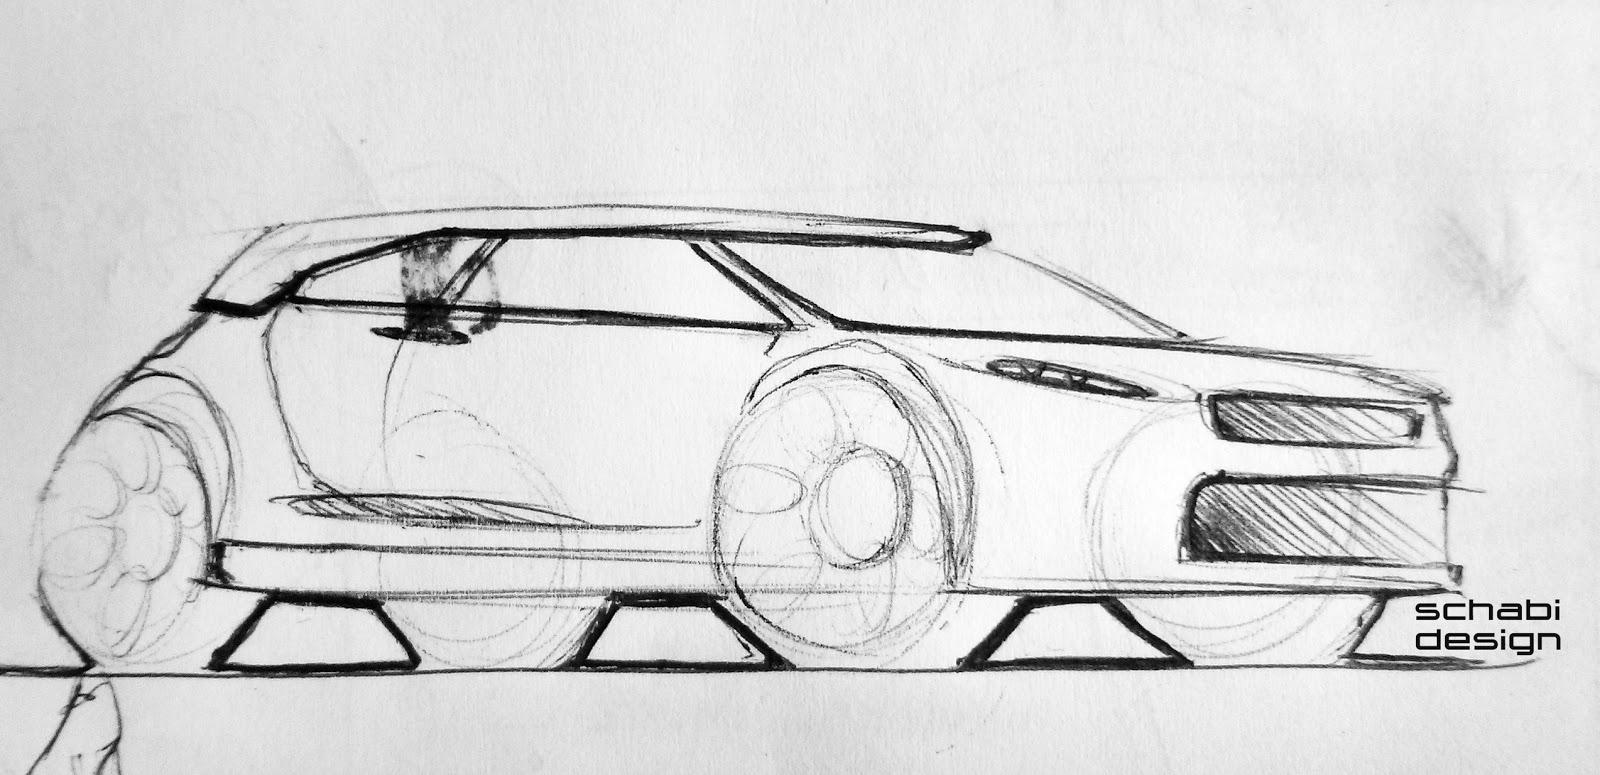 Schabi Design Sketch Site: Car Sketch